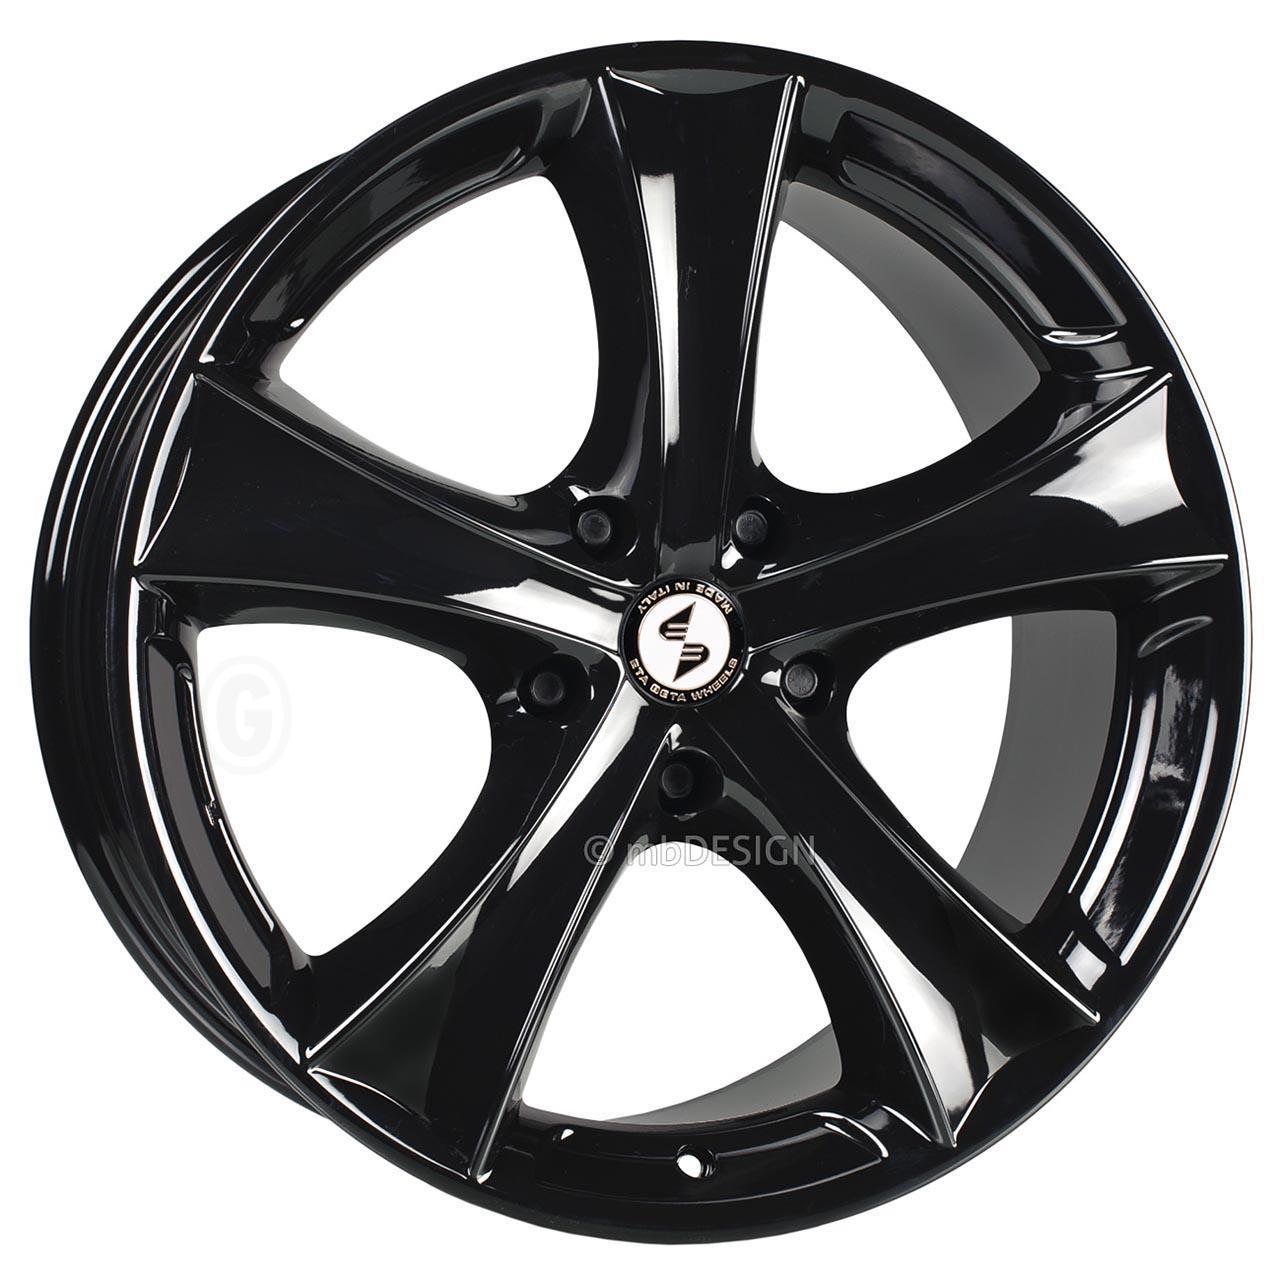 Etabeta Tettsut Black shiny 9x19 5x120 ET45